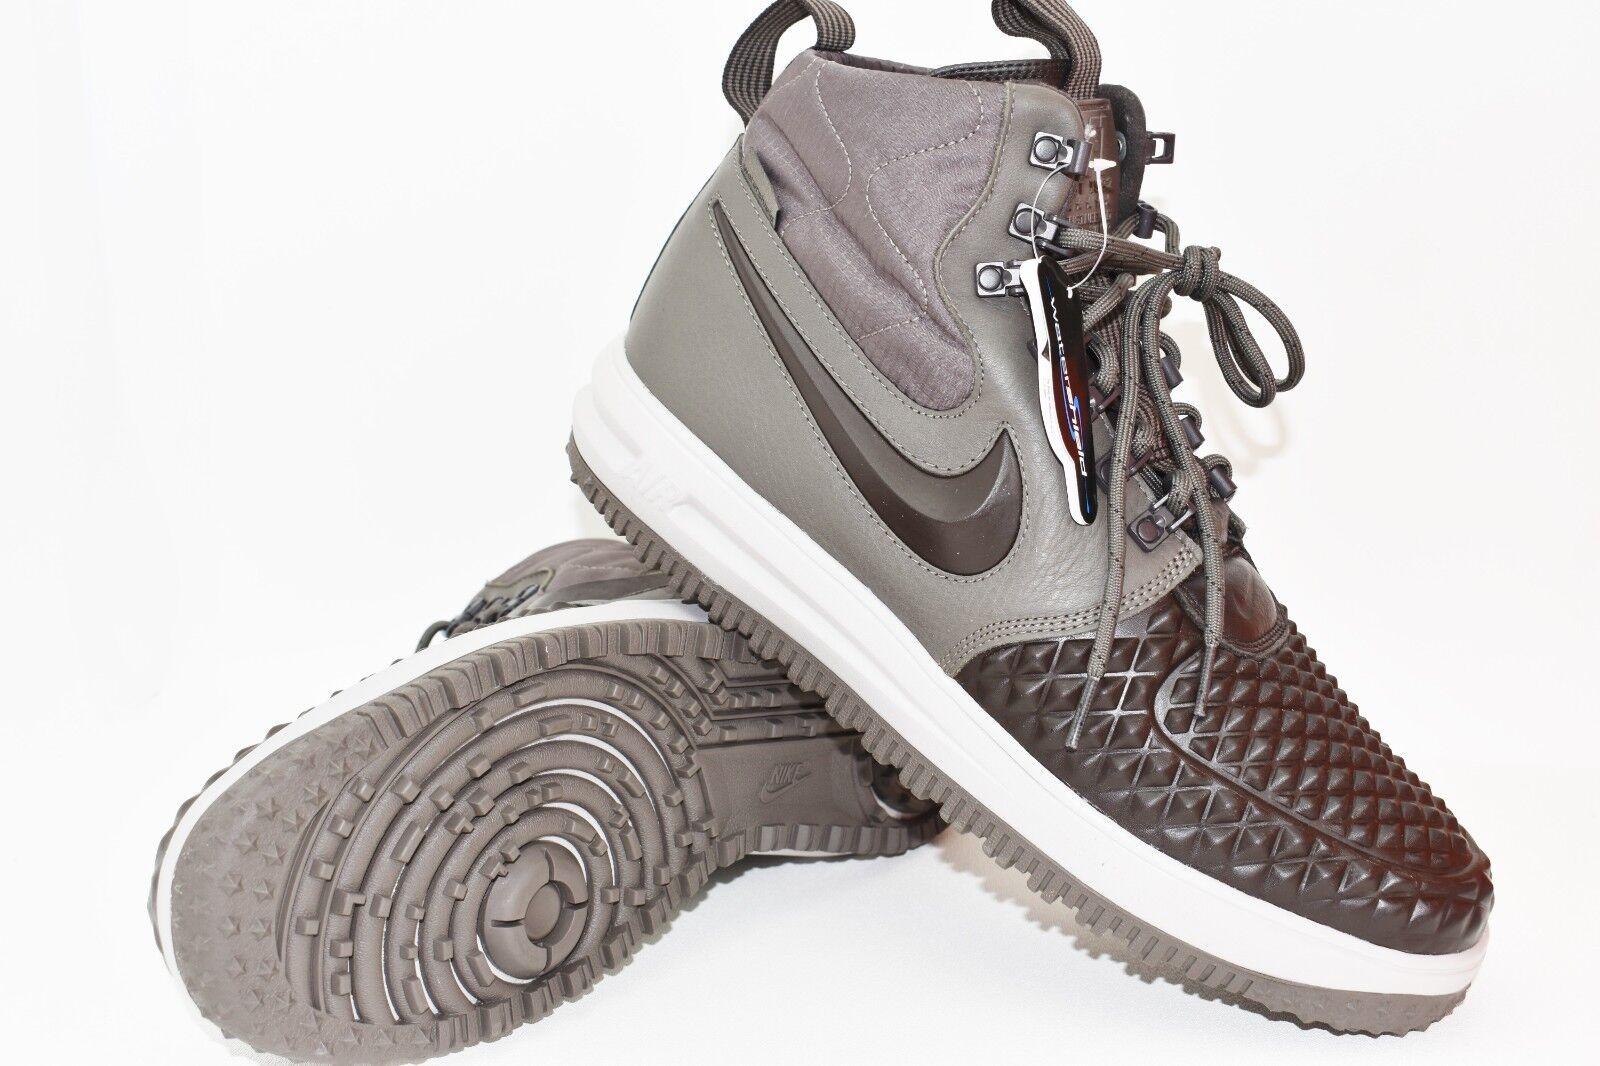 New Nike LF1 Duckboot '17 Size US 9 Ridgerock Velvet Brown Men 916682 203